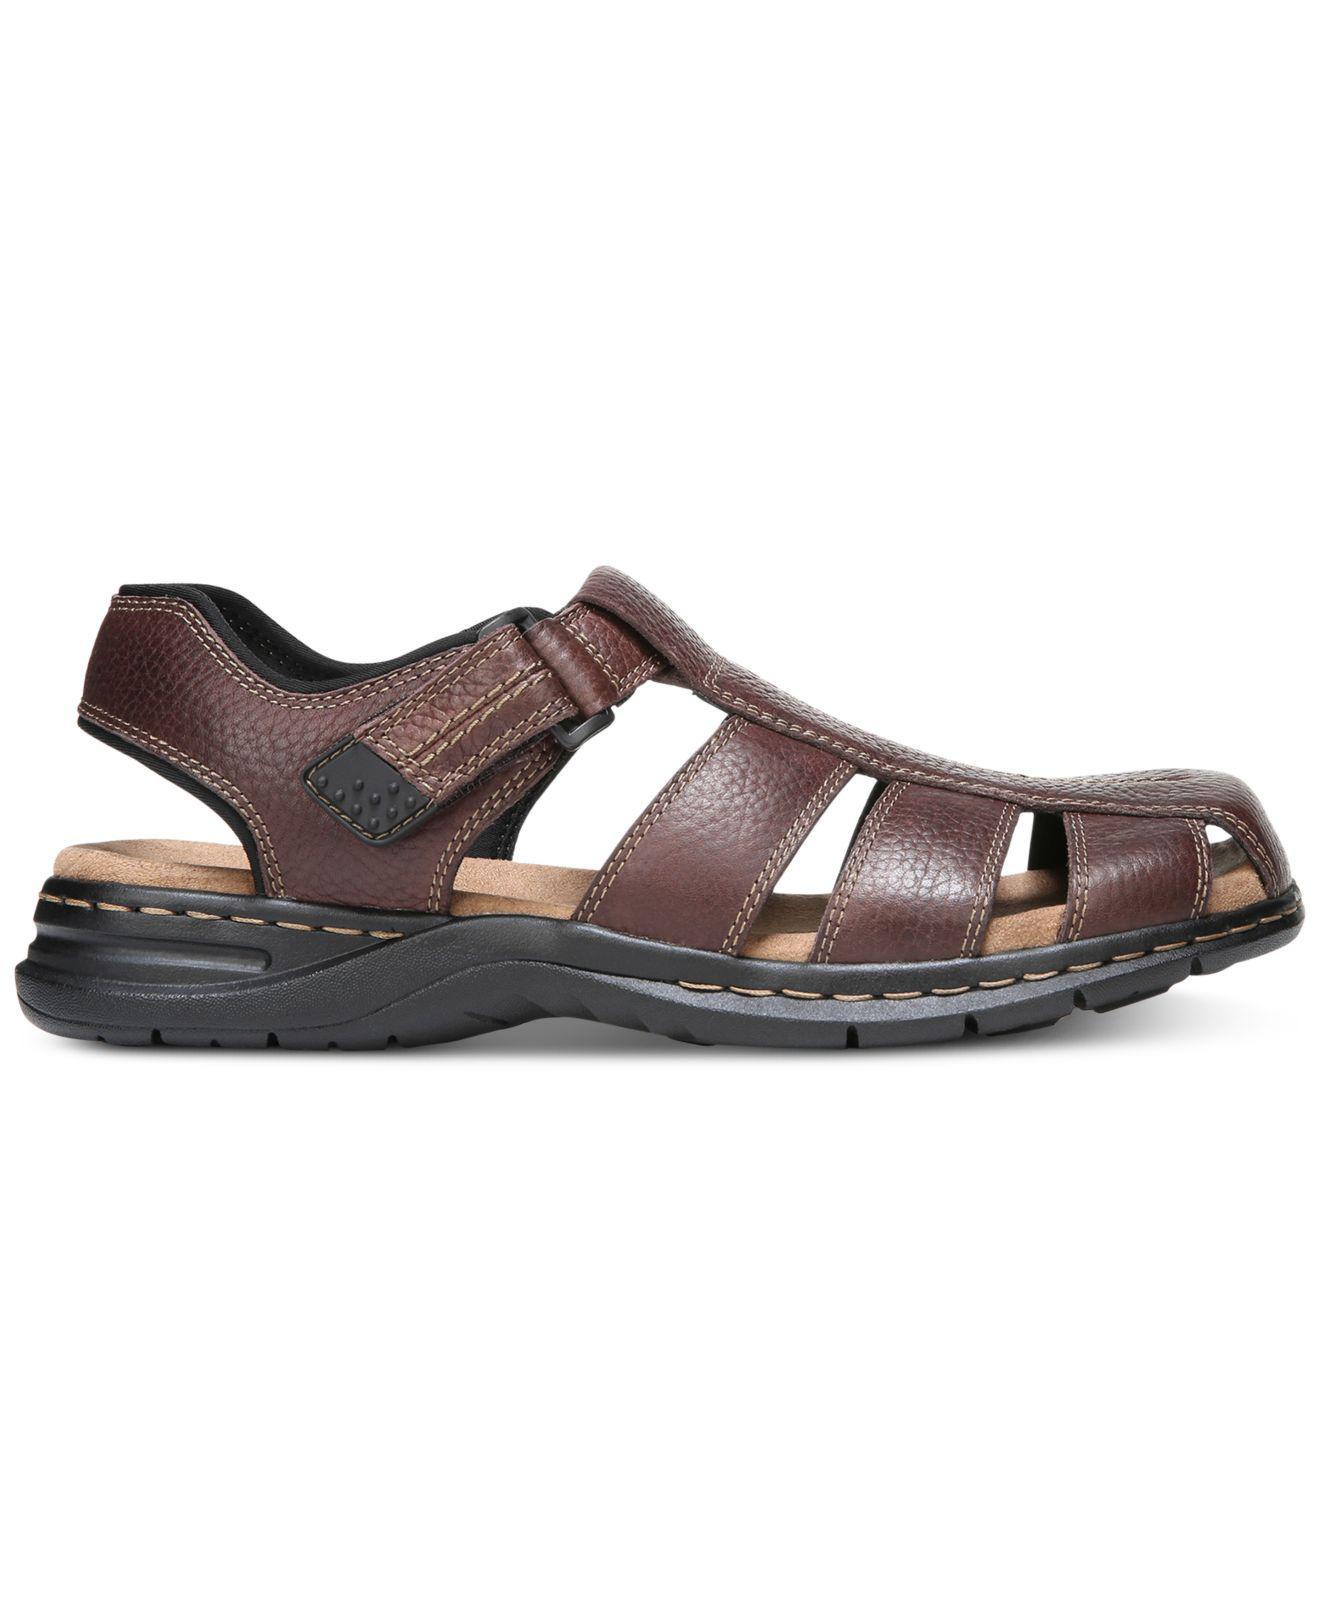 65564dad8584 Lyst - Dr. Scholls Gaston Leather Sandals for Men